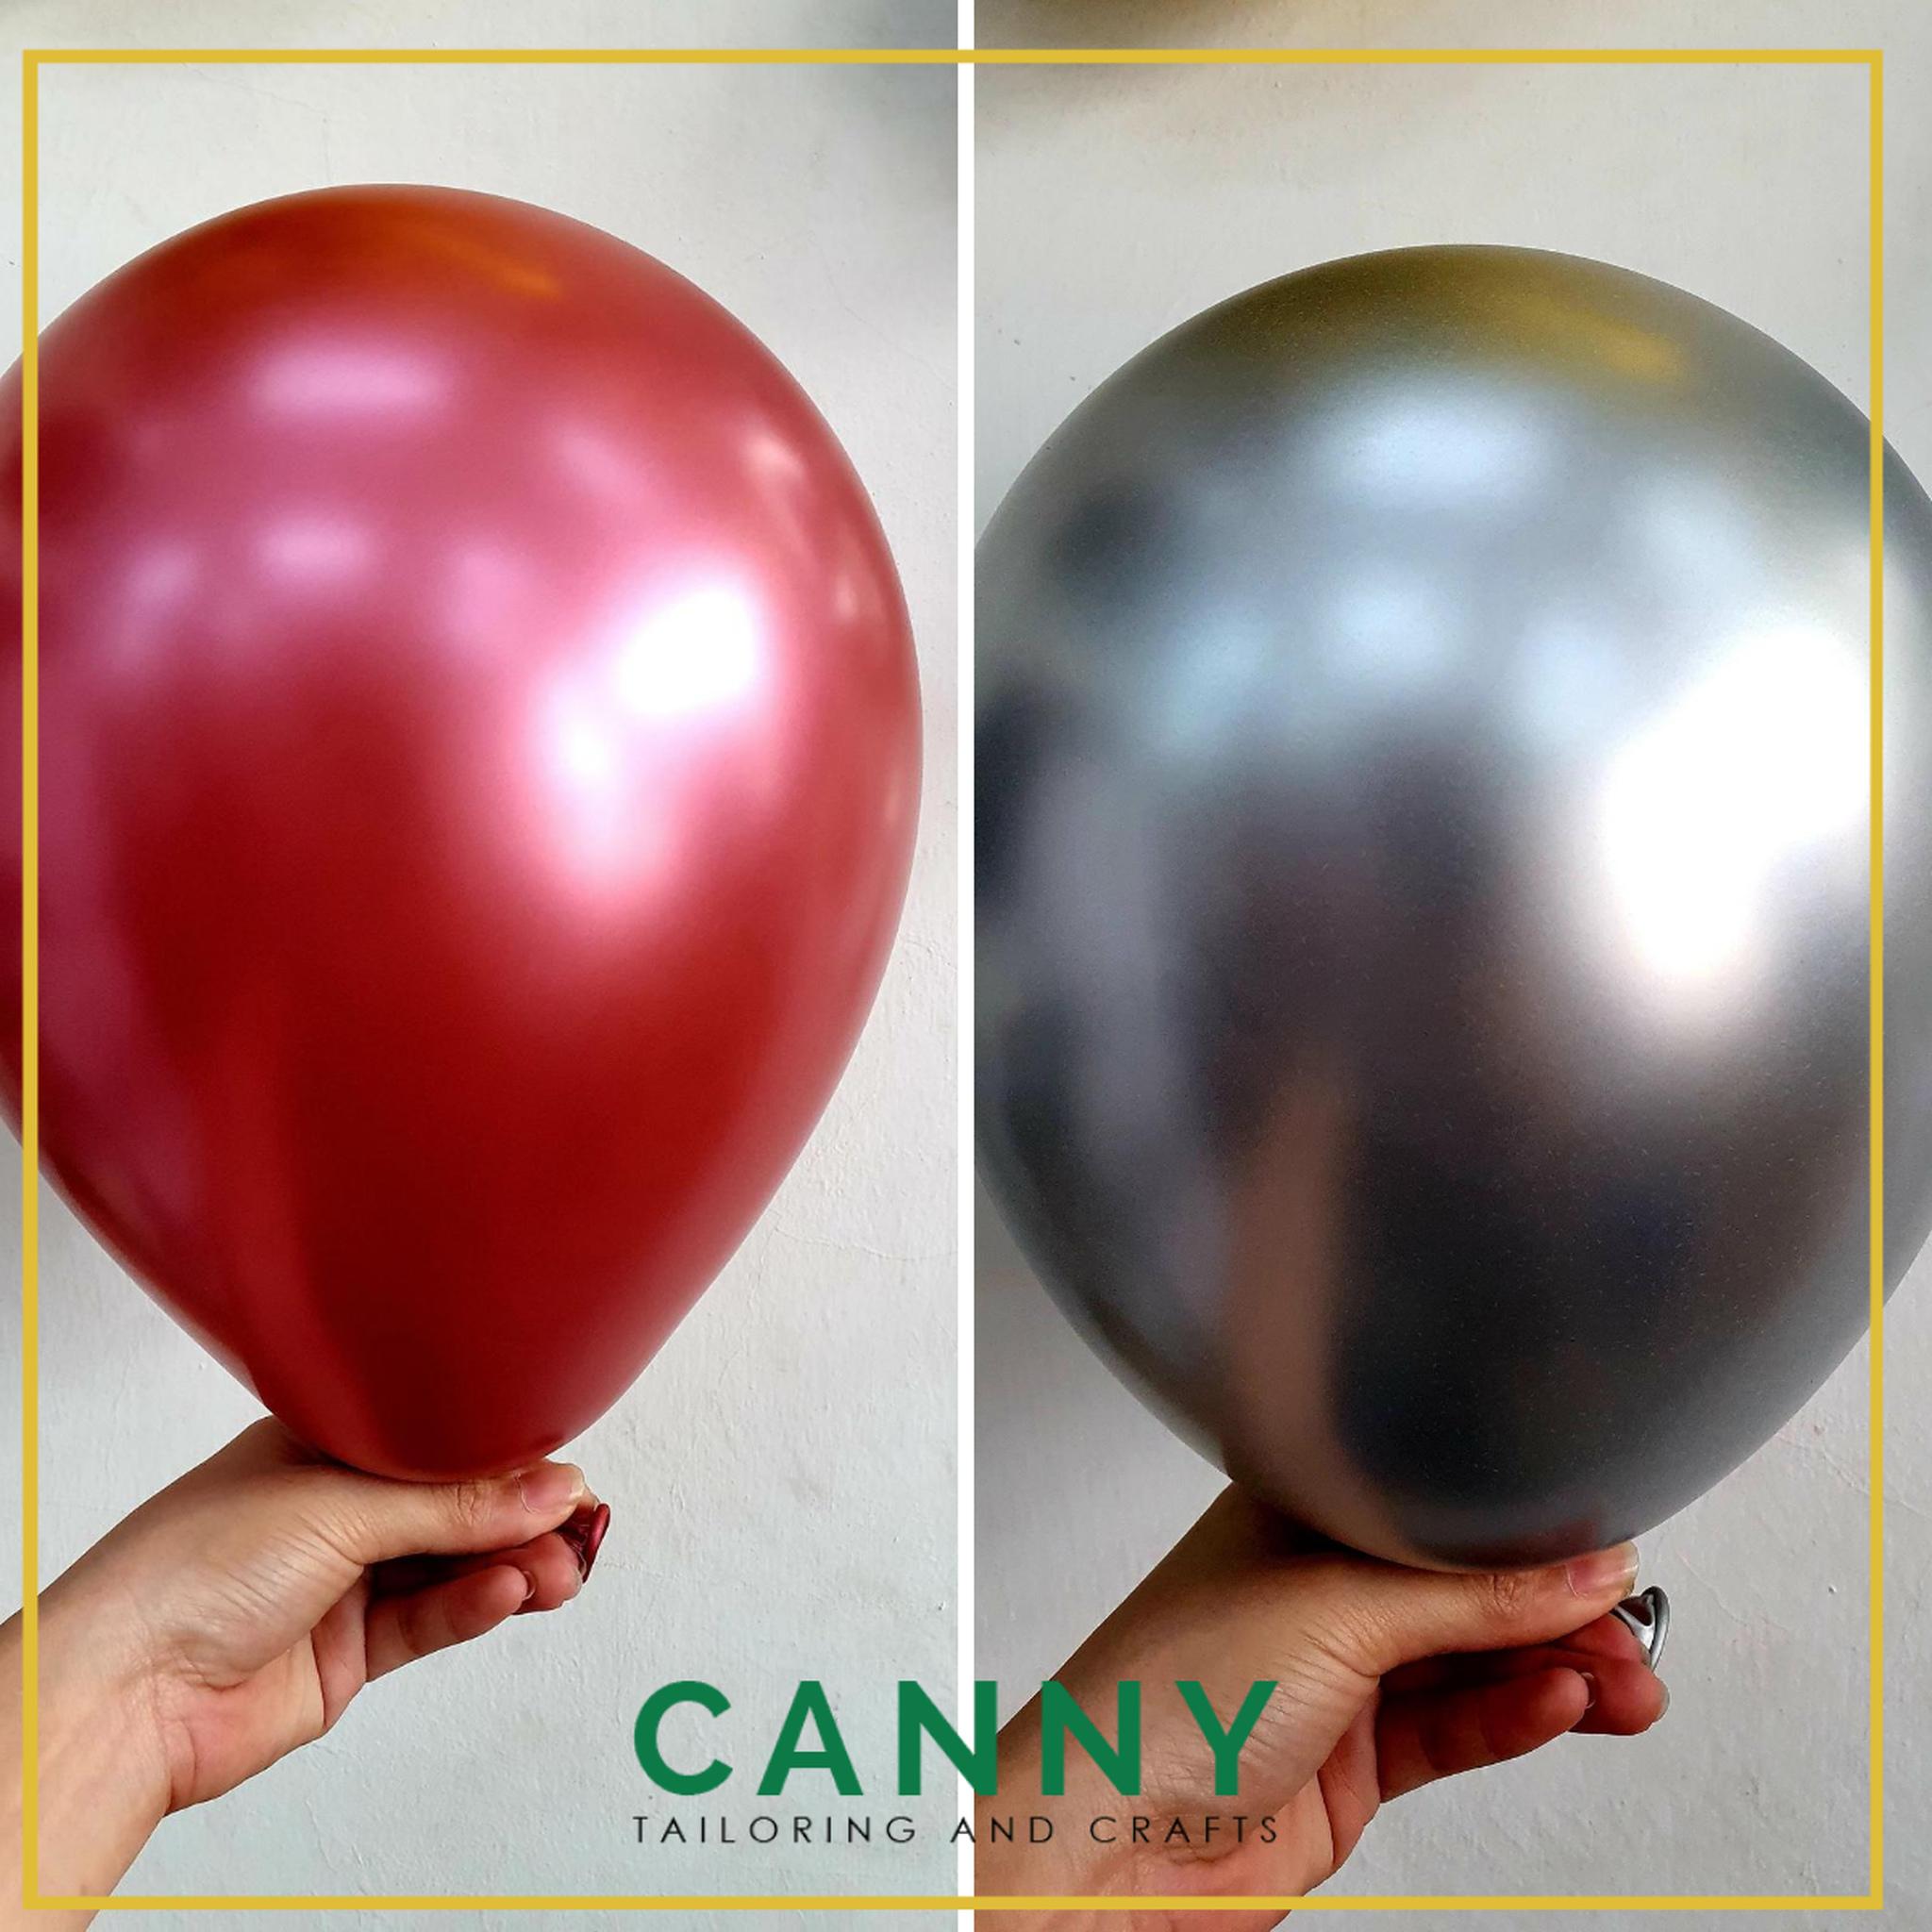 "1 pcs Chrome Balloon 12"" / Belon Chrome Berkilat 12 Inci (1 pcs)"